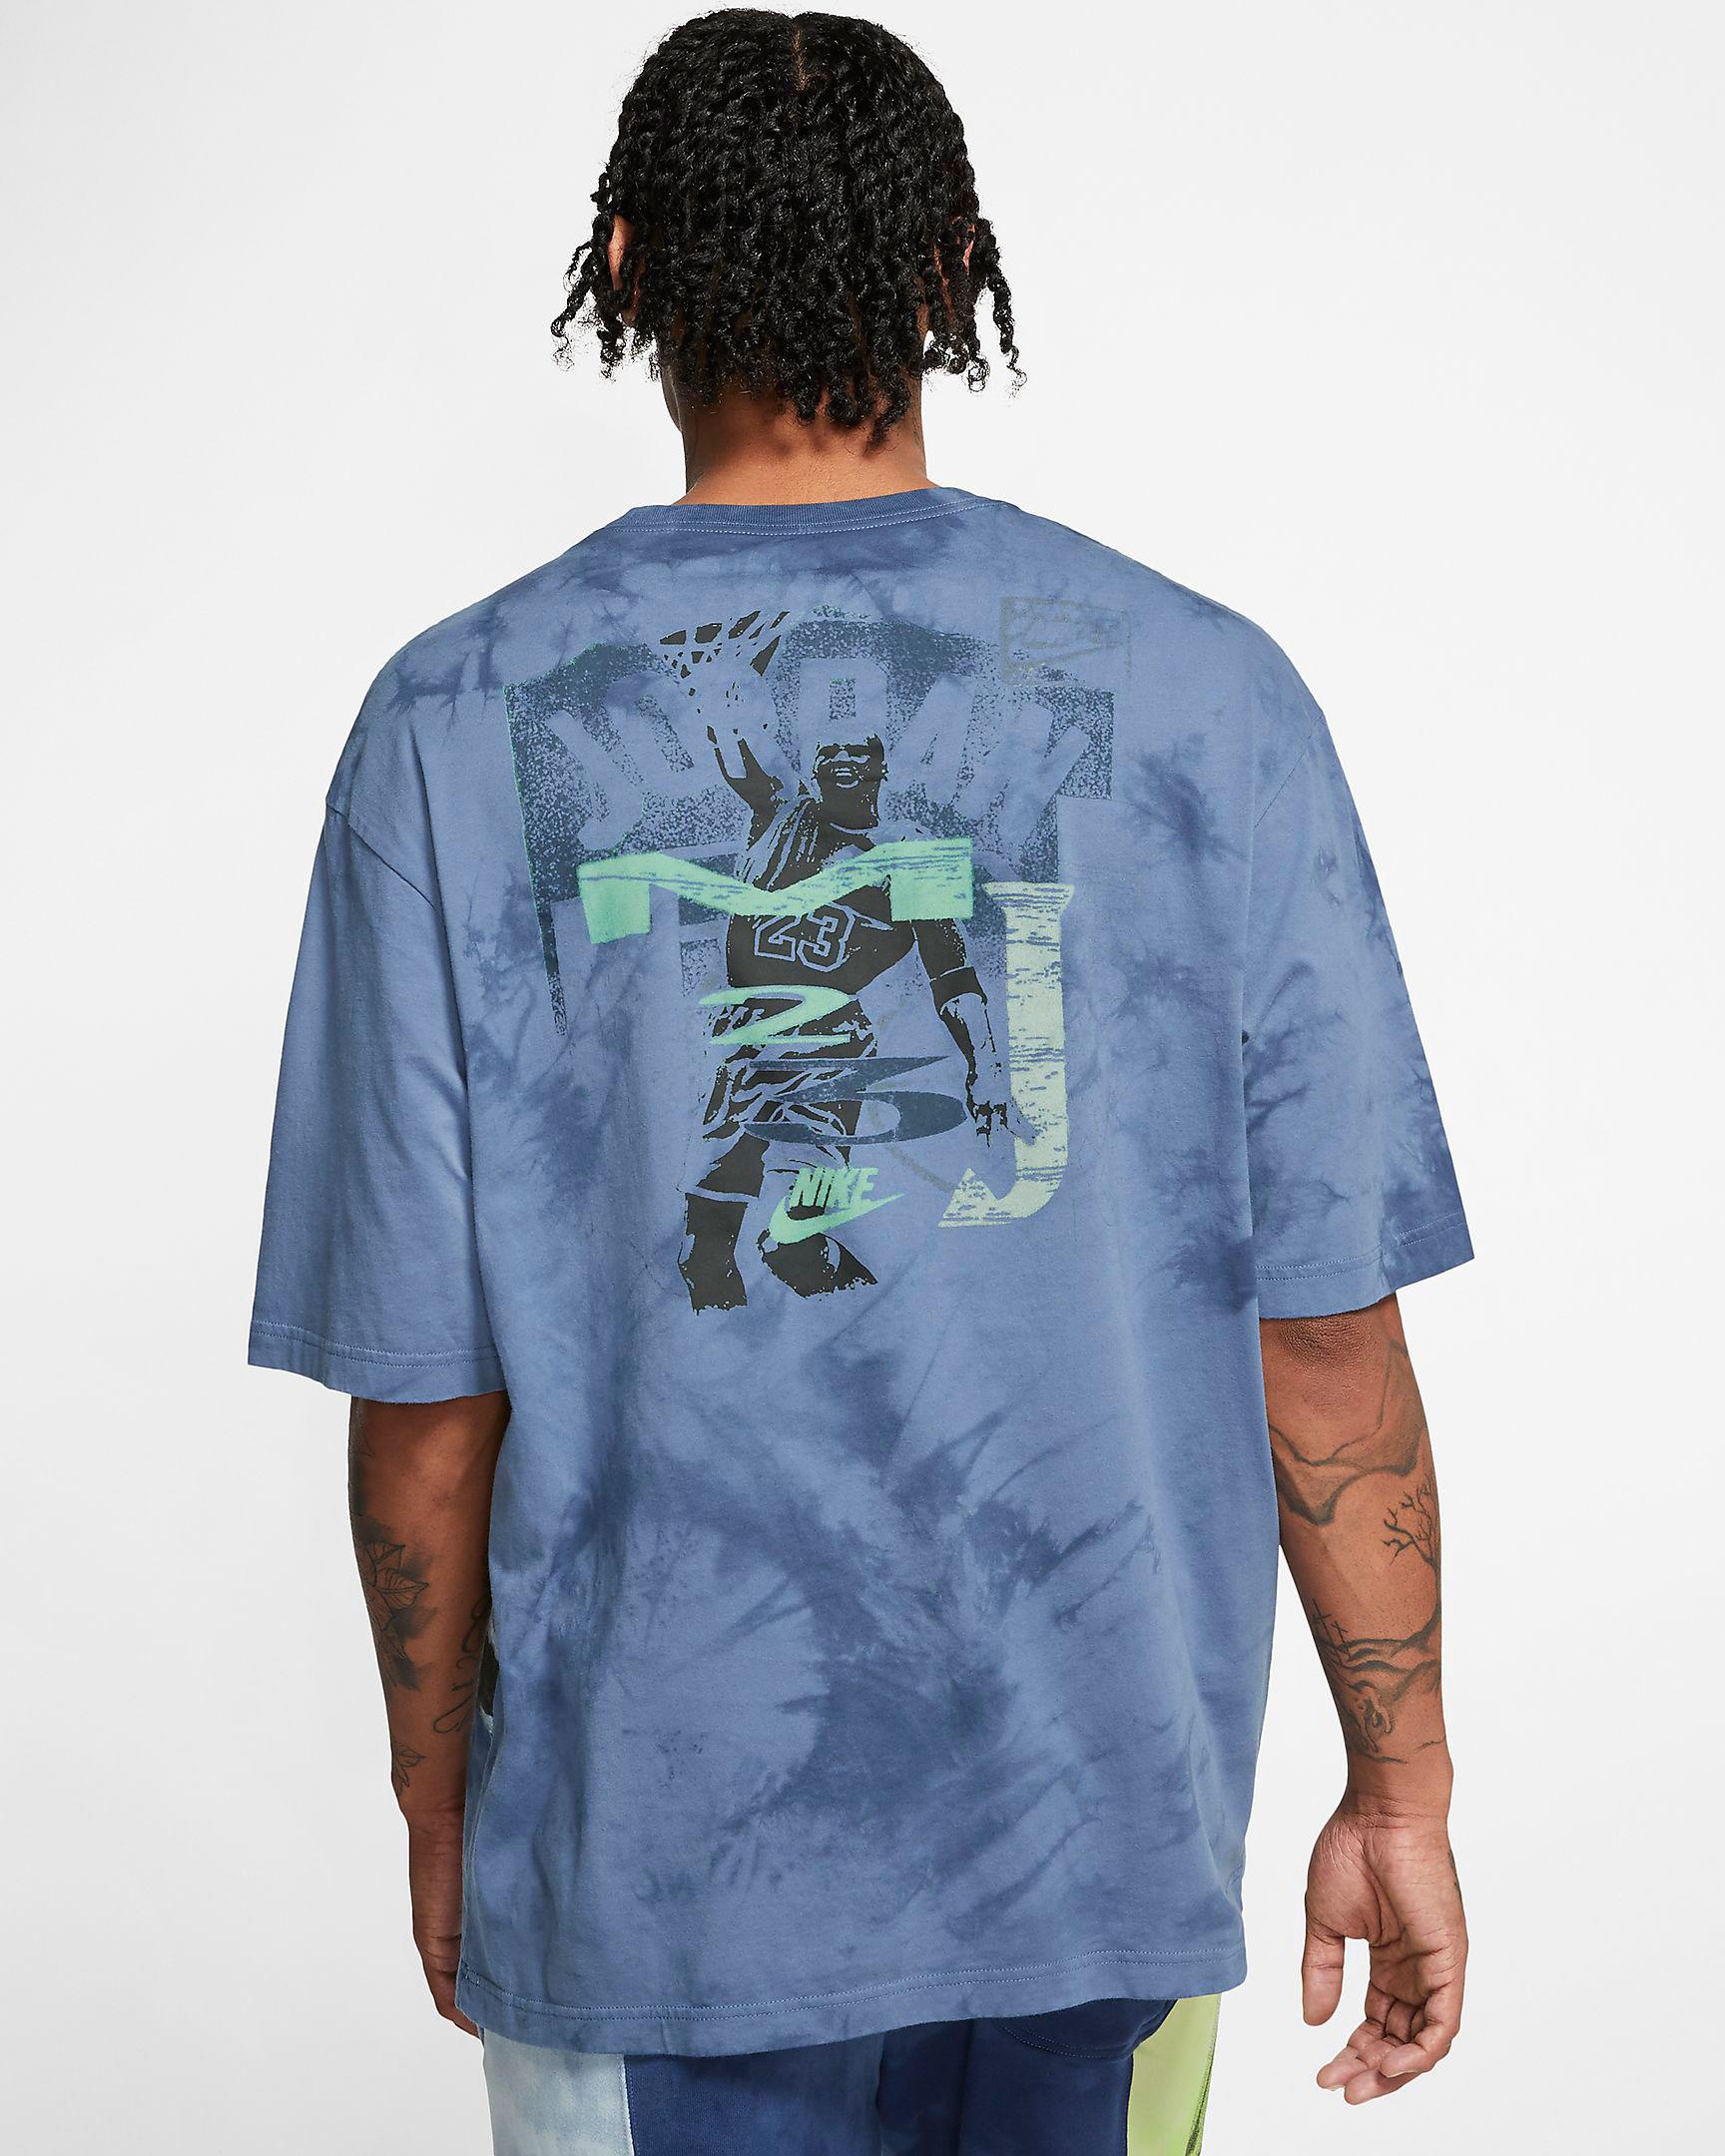 jordan-remastered-vintage-shirt-blue-green-2